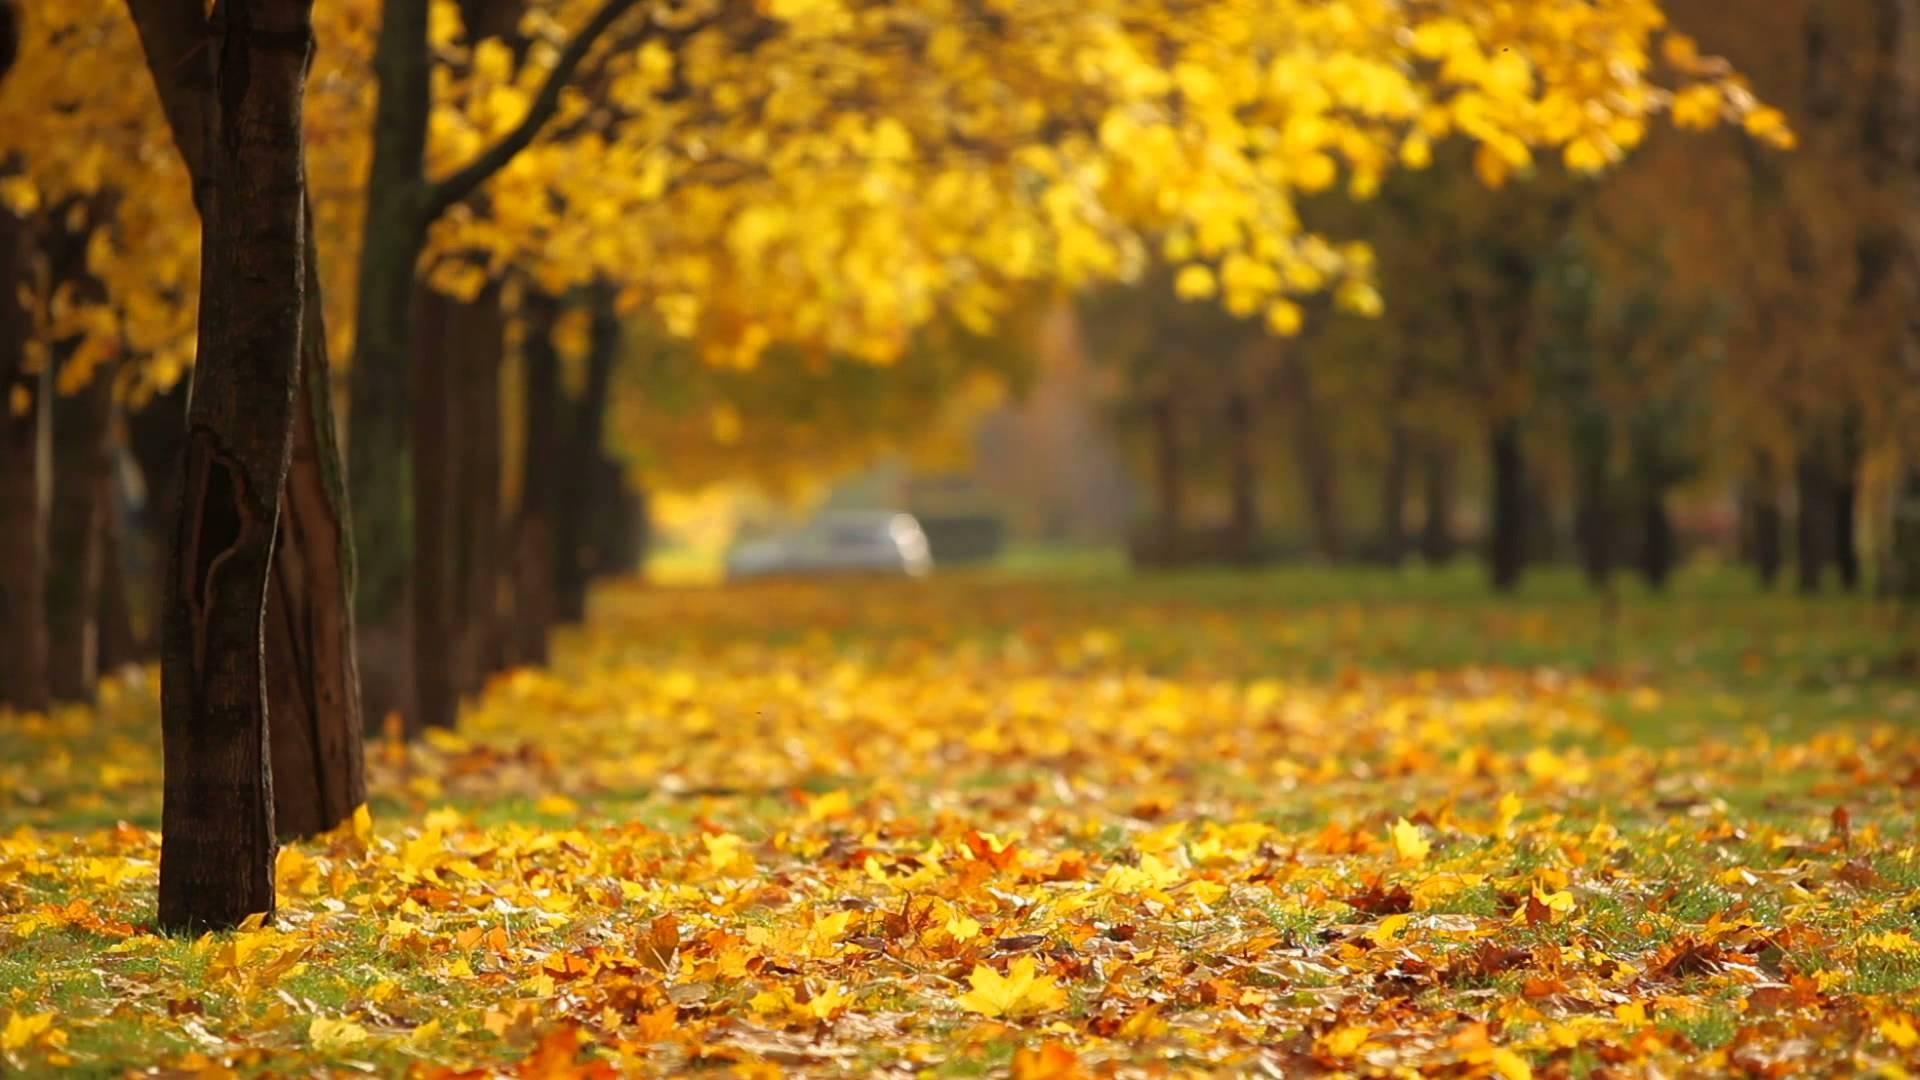 Pretty Fall Iphone Wallpaper Fall Background 183 ① Download Free Stunning Full Hd